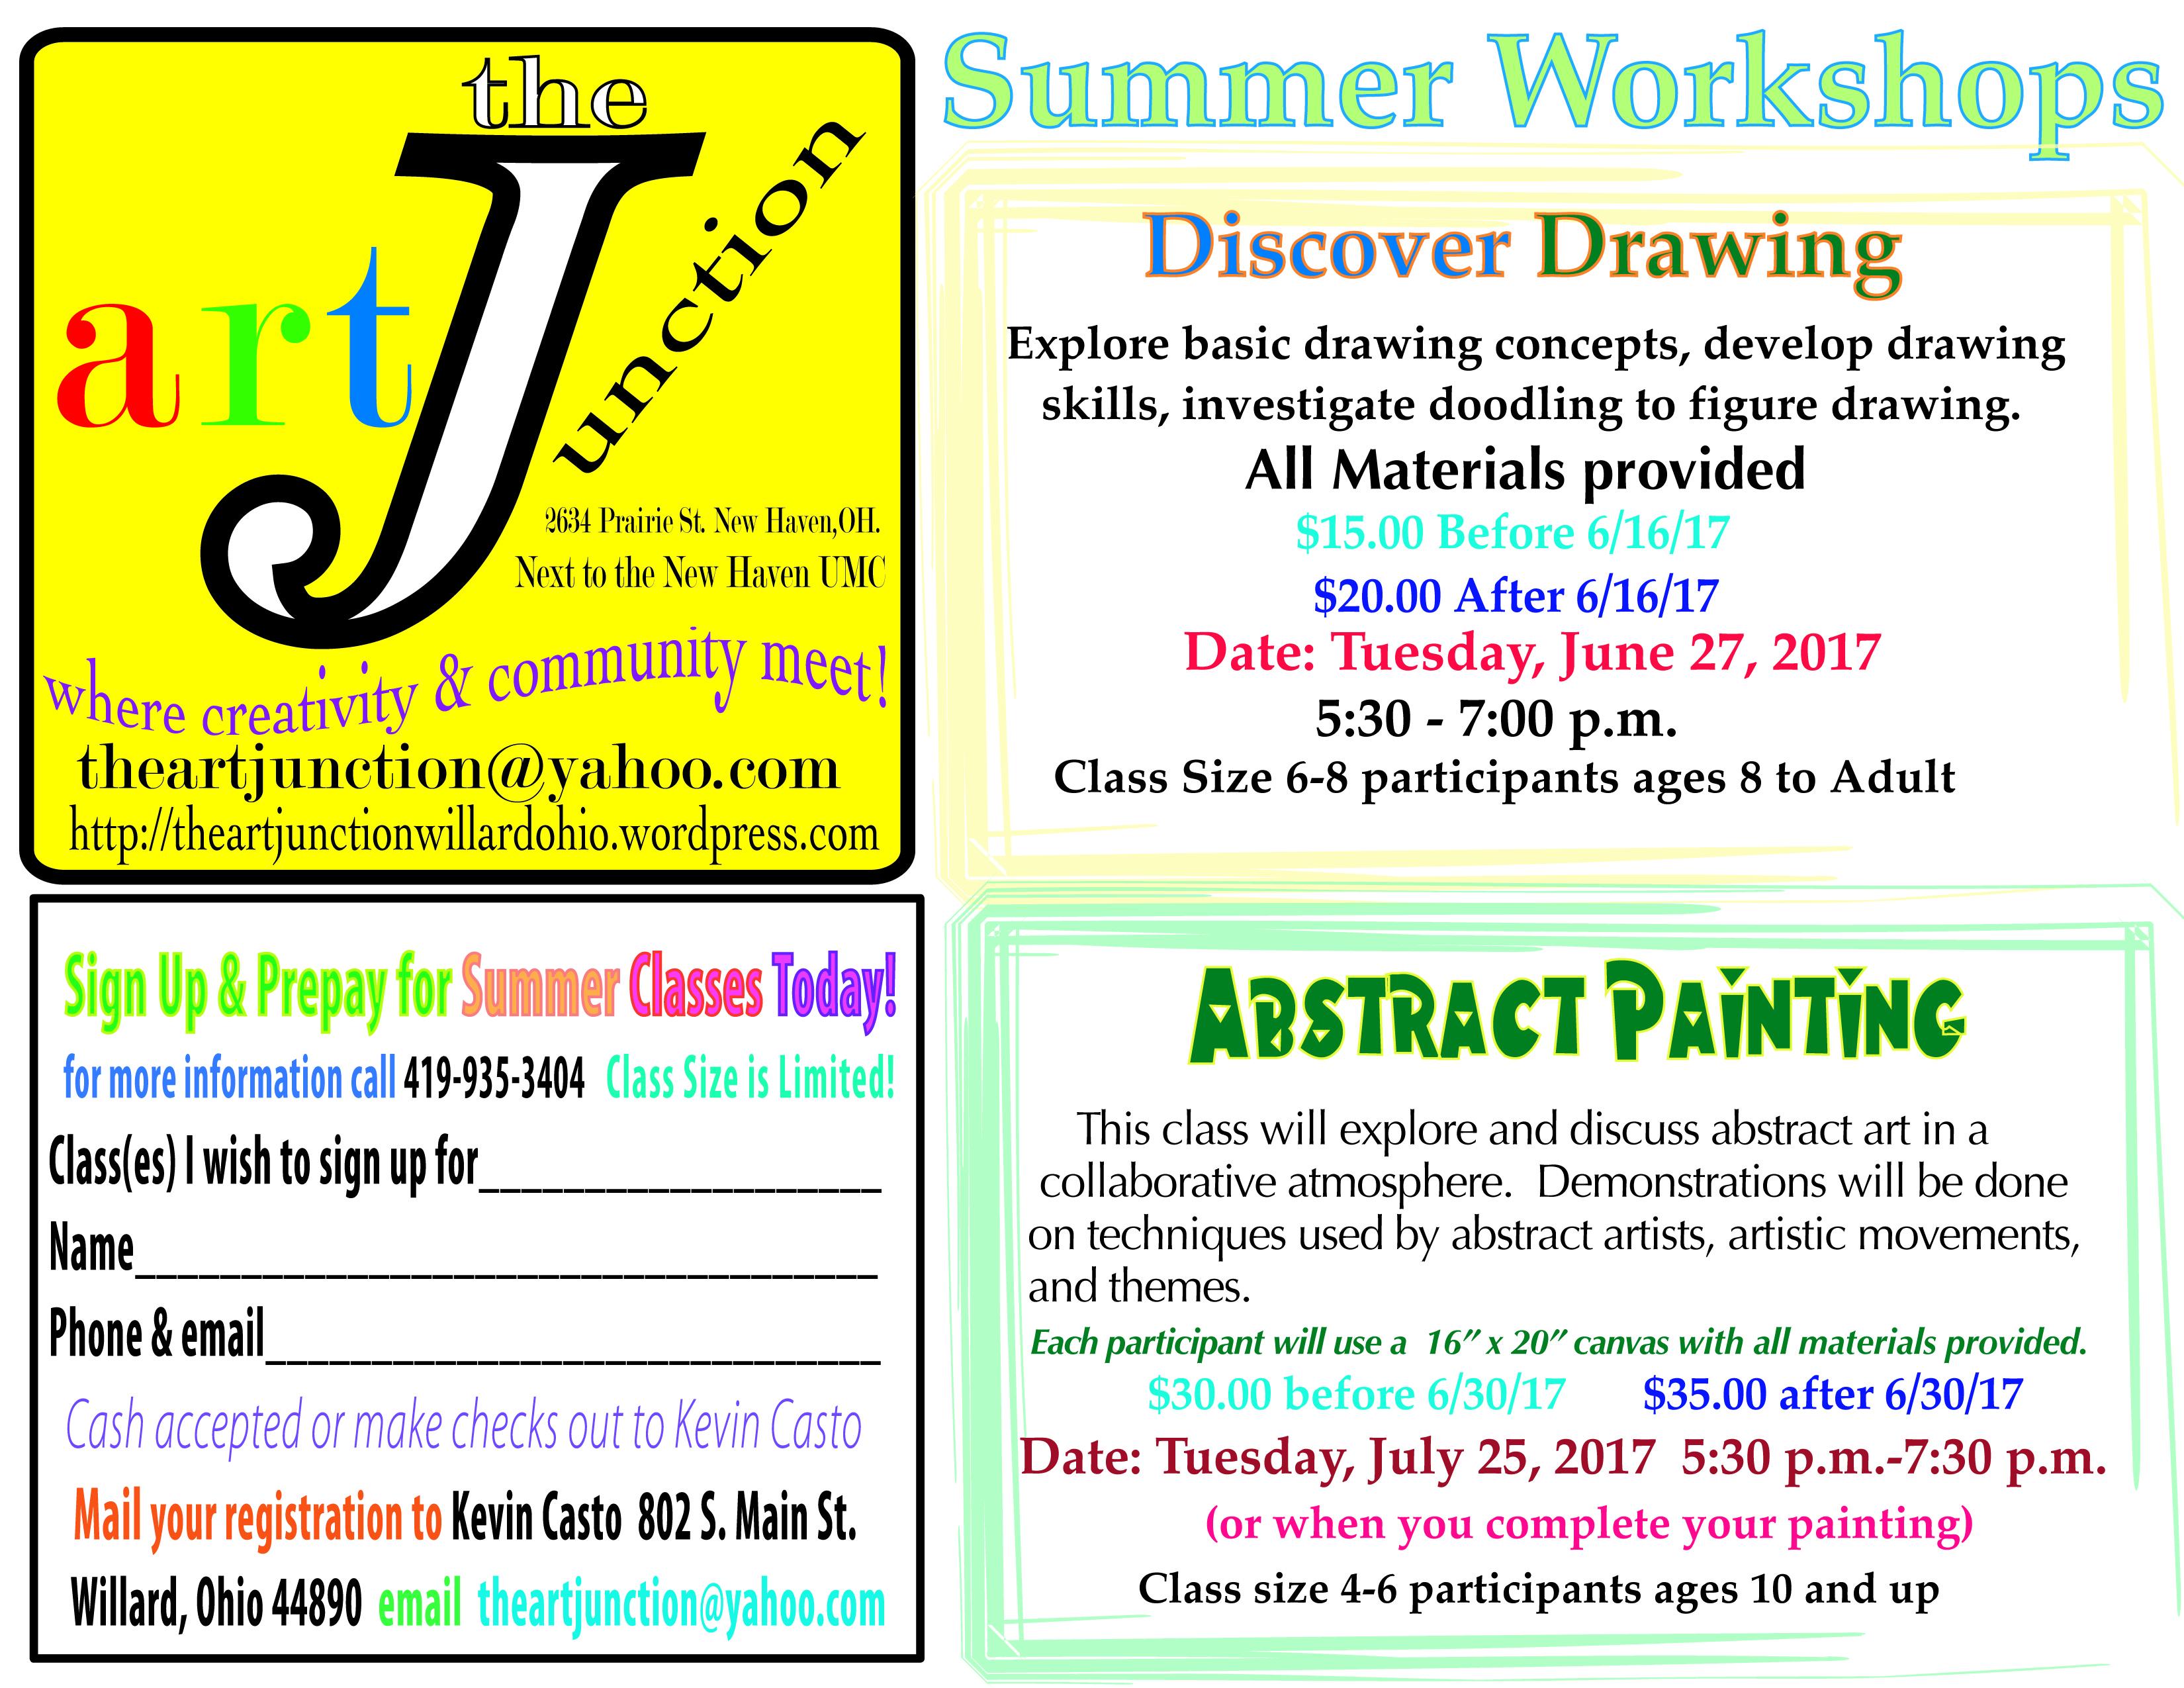 Summerworkshops'17